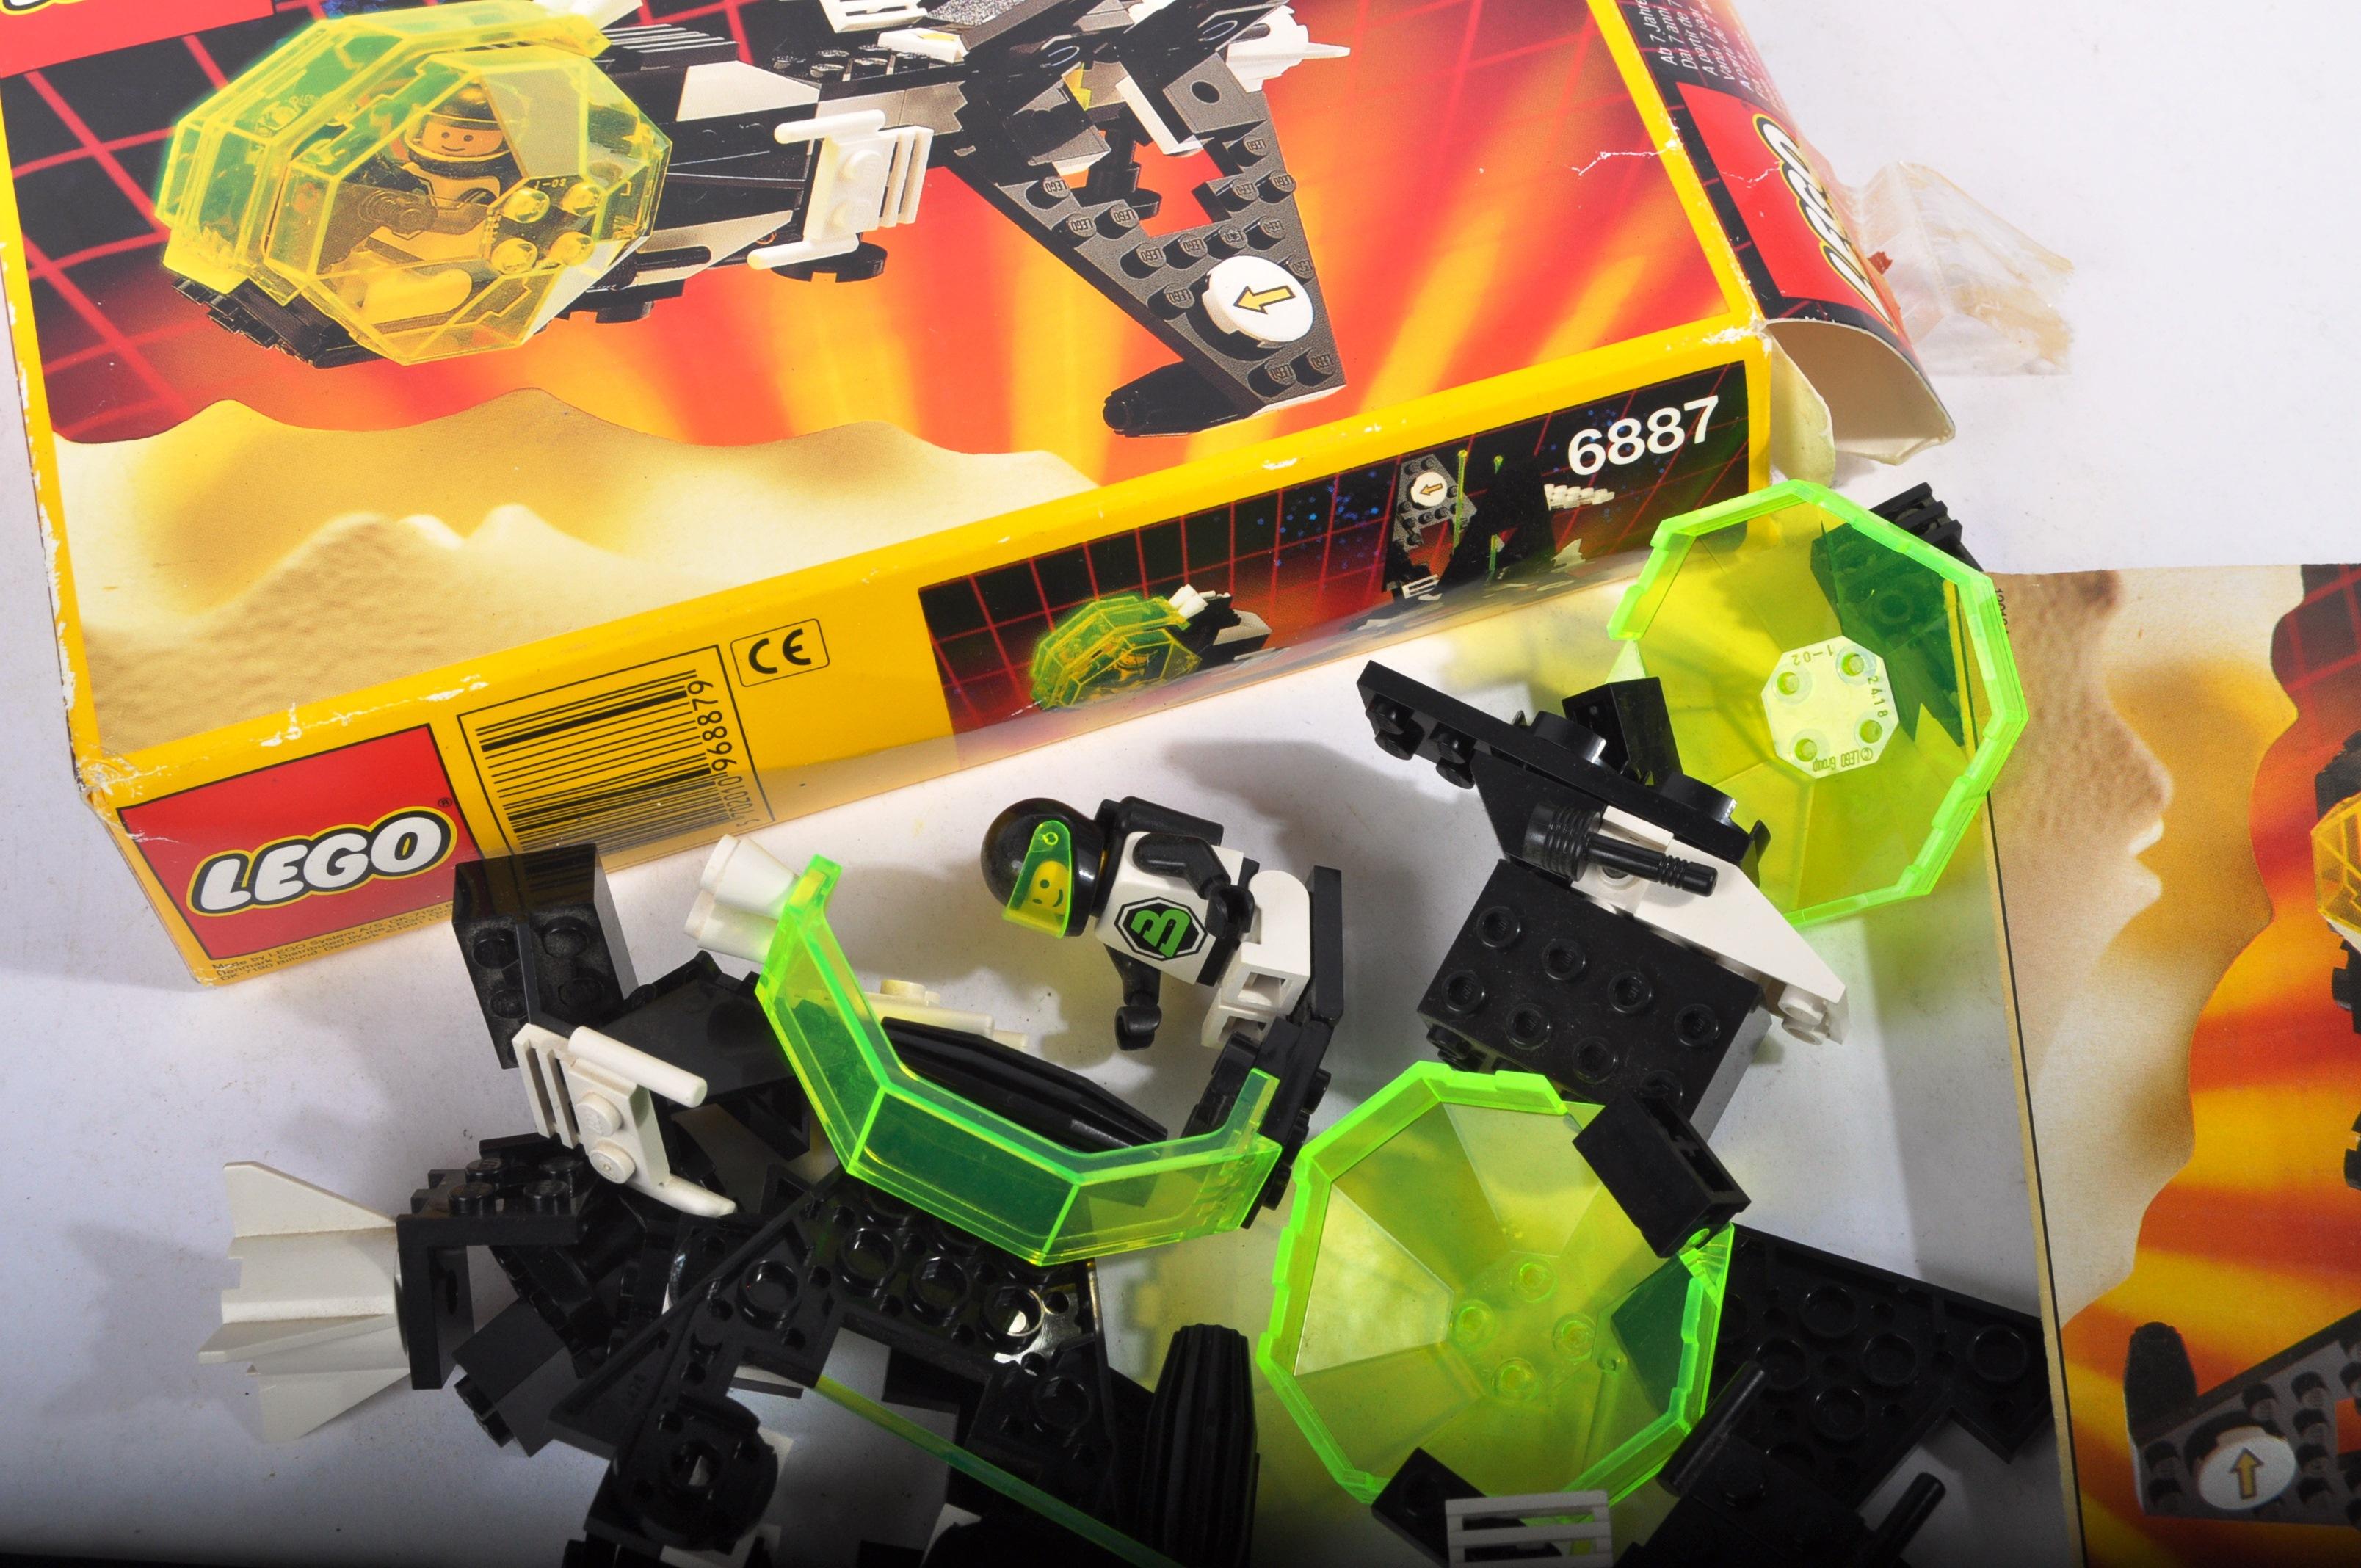 LEGO SETS - BLACKTRON - 6832 / 6833 / 6851 / 6878 / 6887 - Image 9 of 10